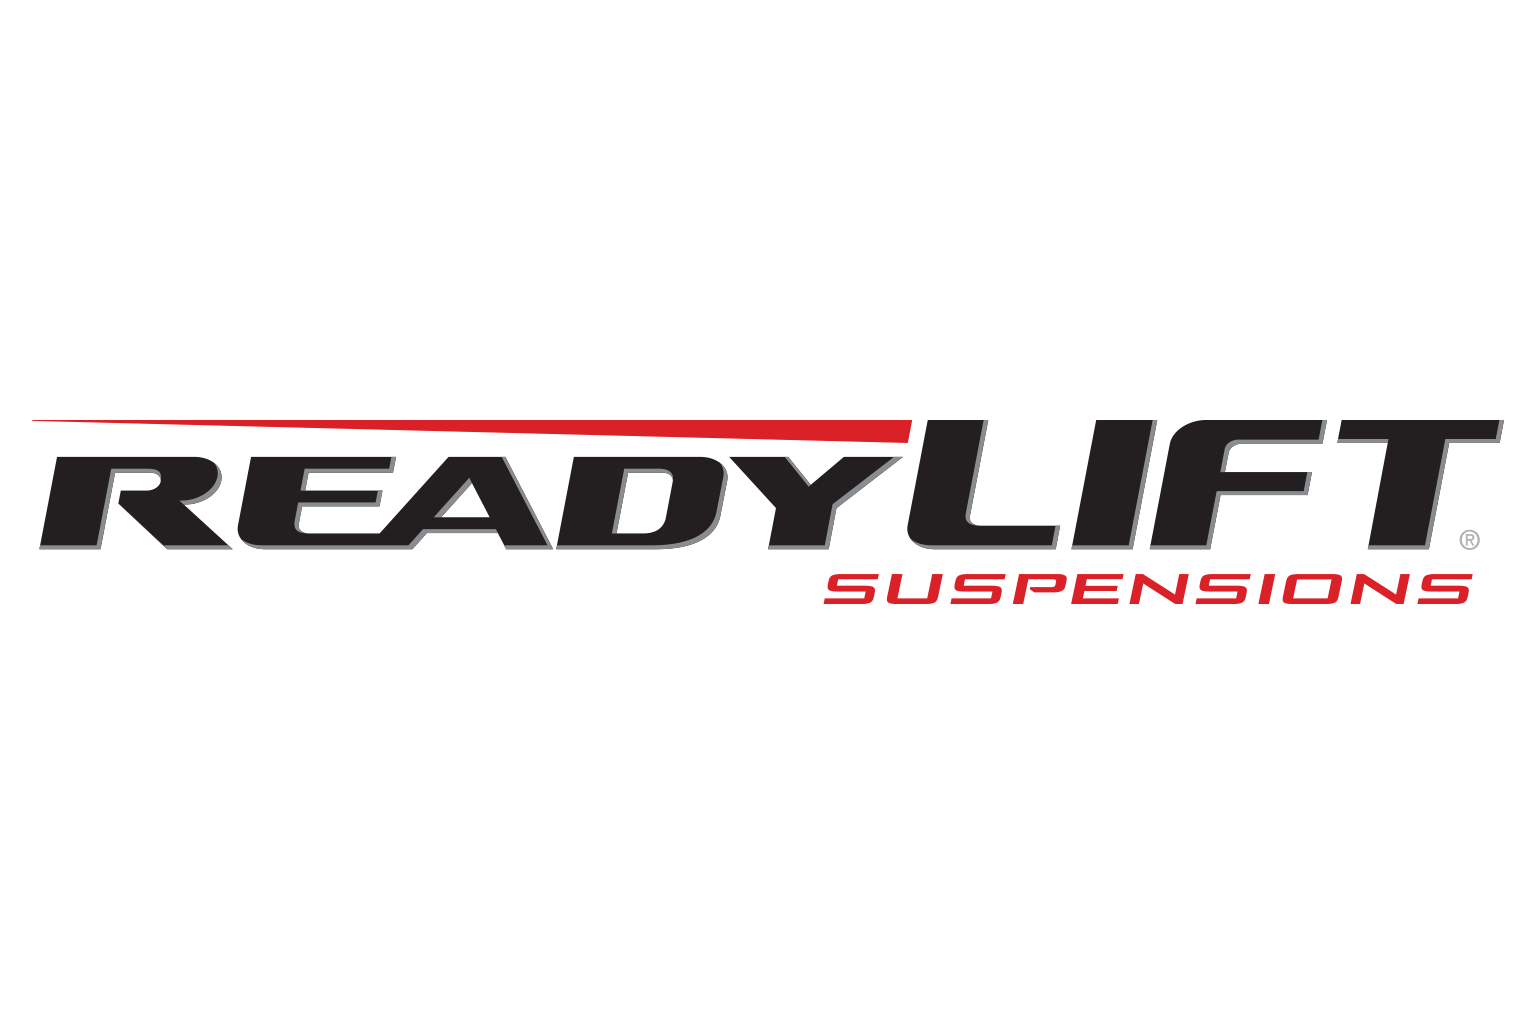 ReadyLIFT